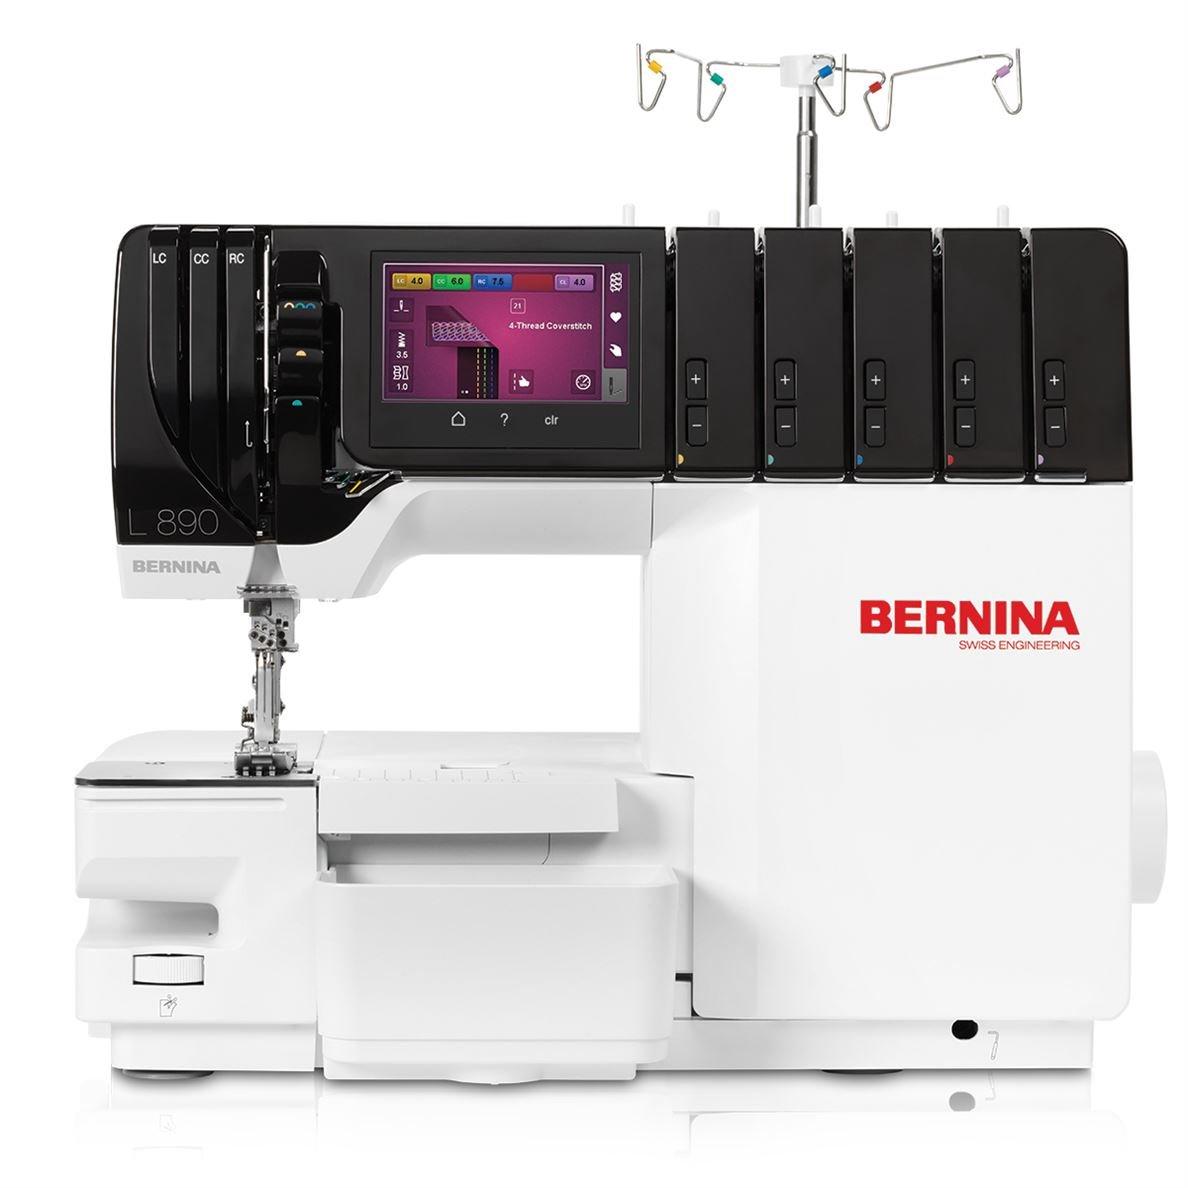 BERNINA L890 Serger